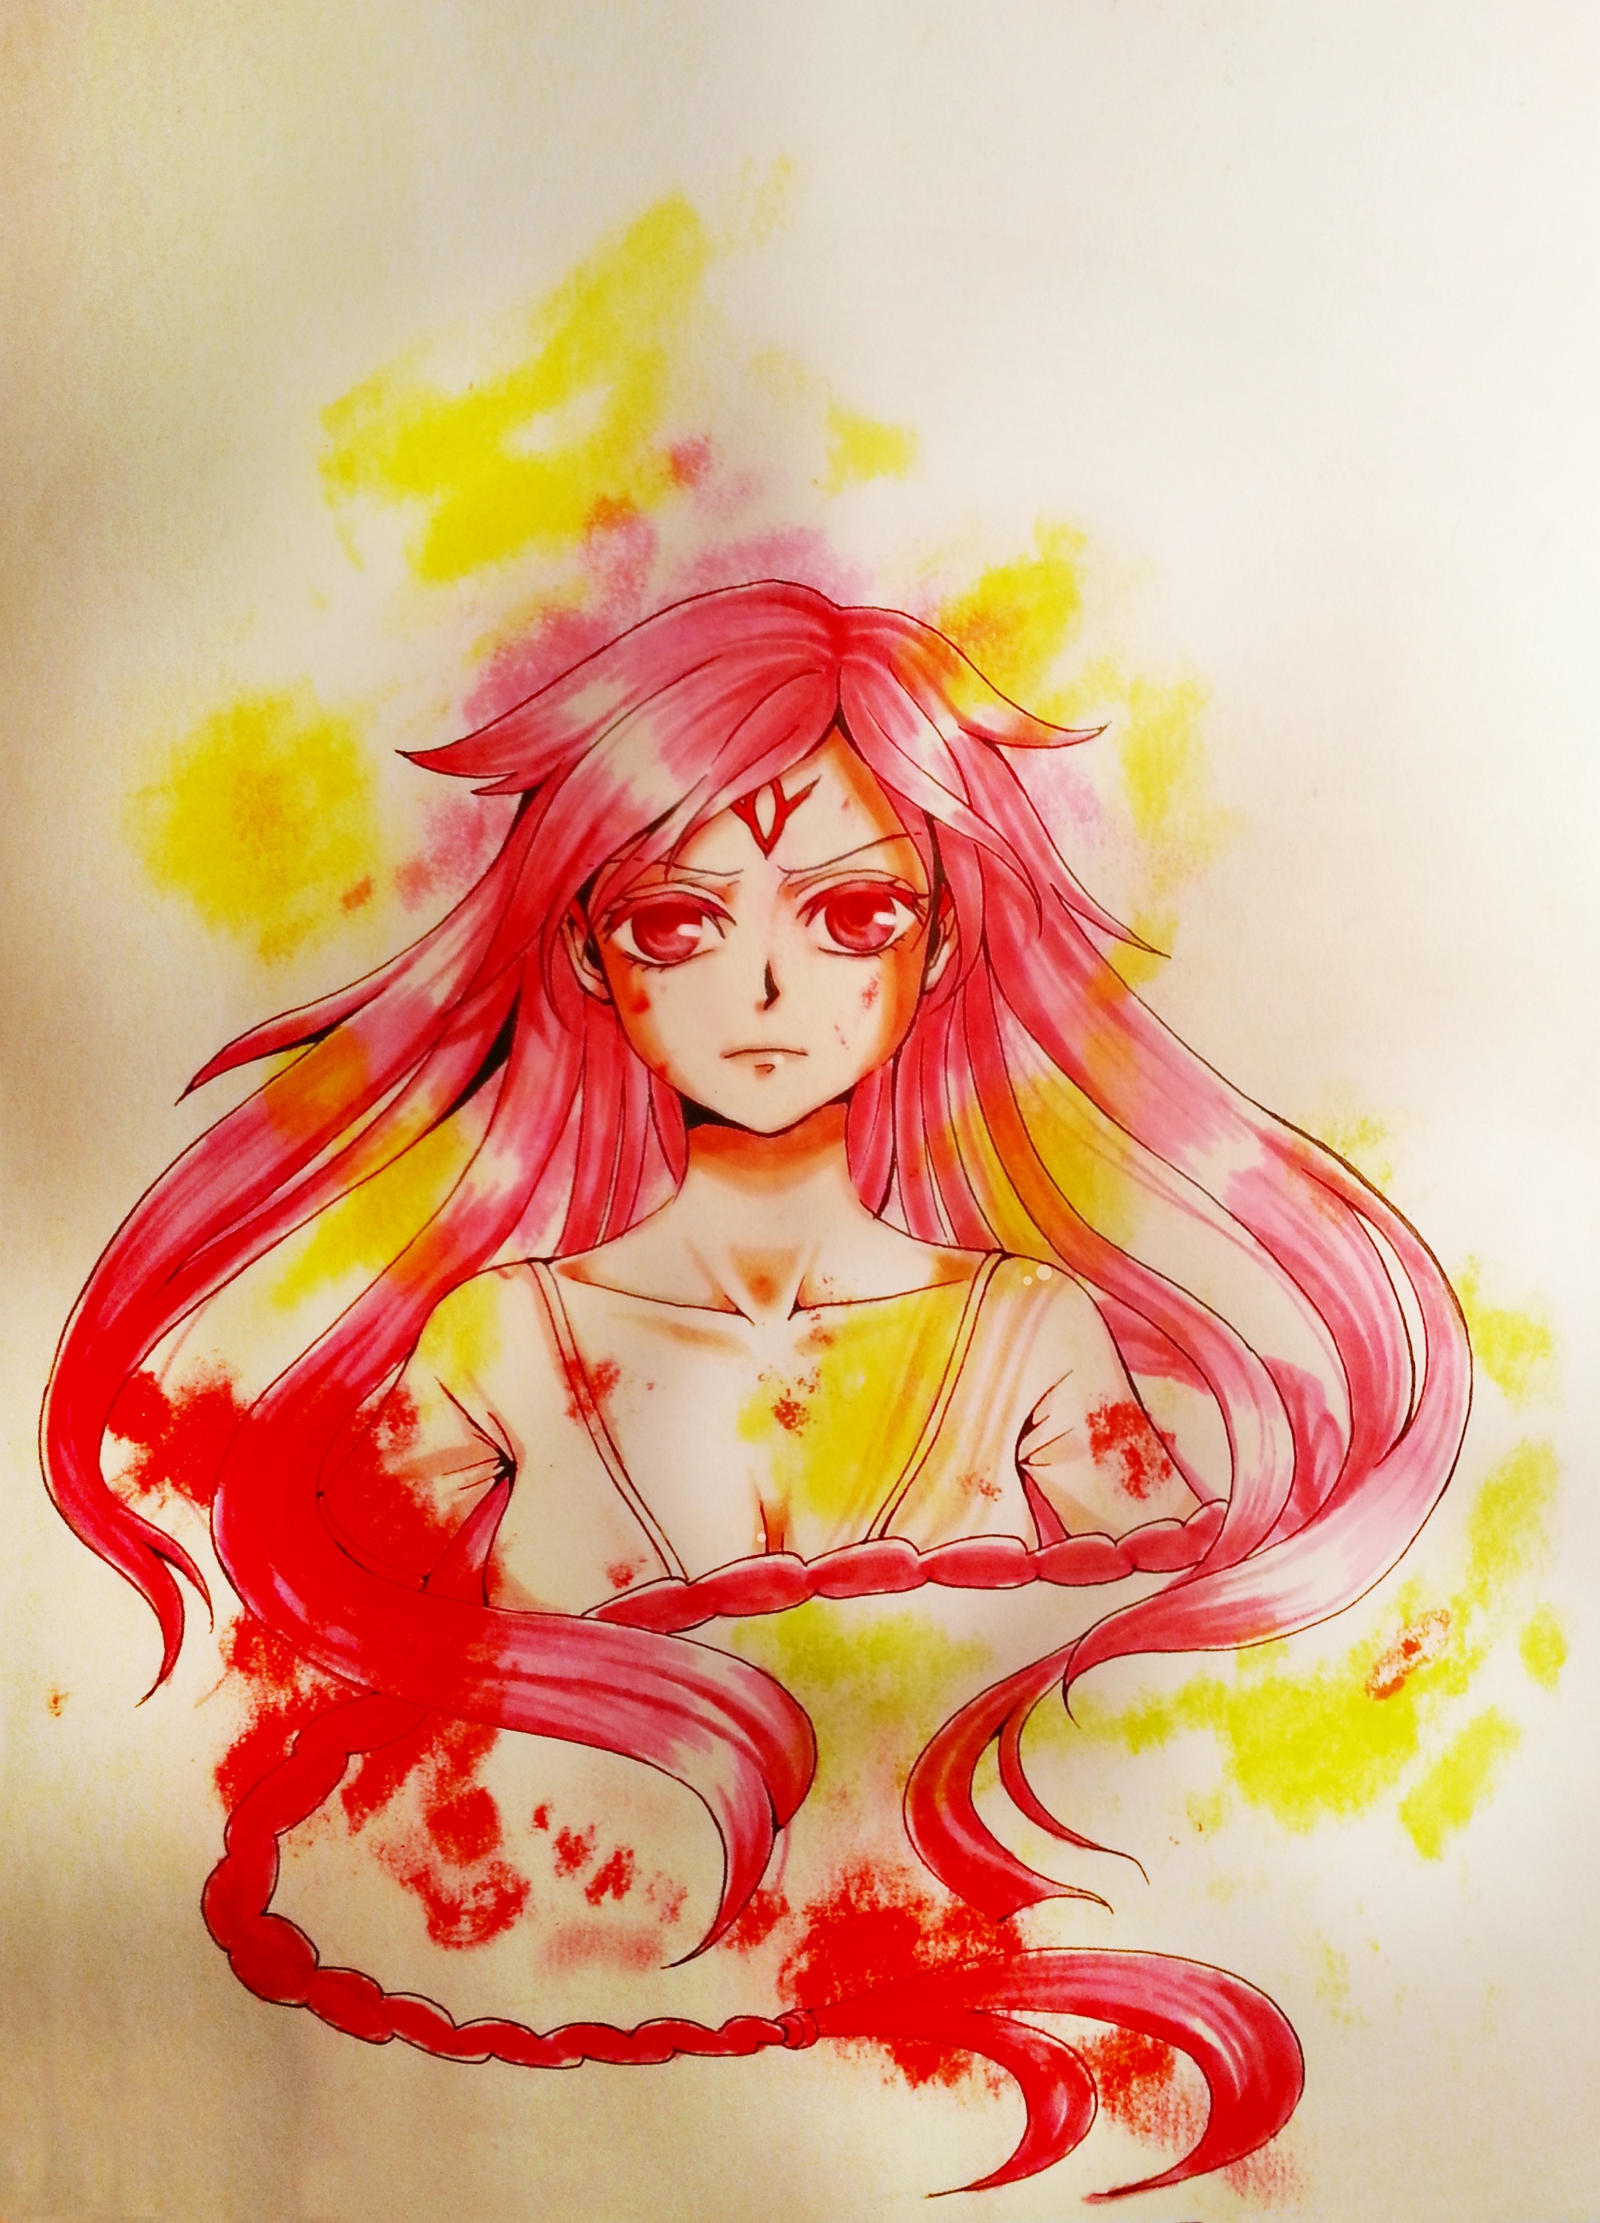 [MAGI] Sheba by hacchan-pixiv